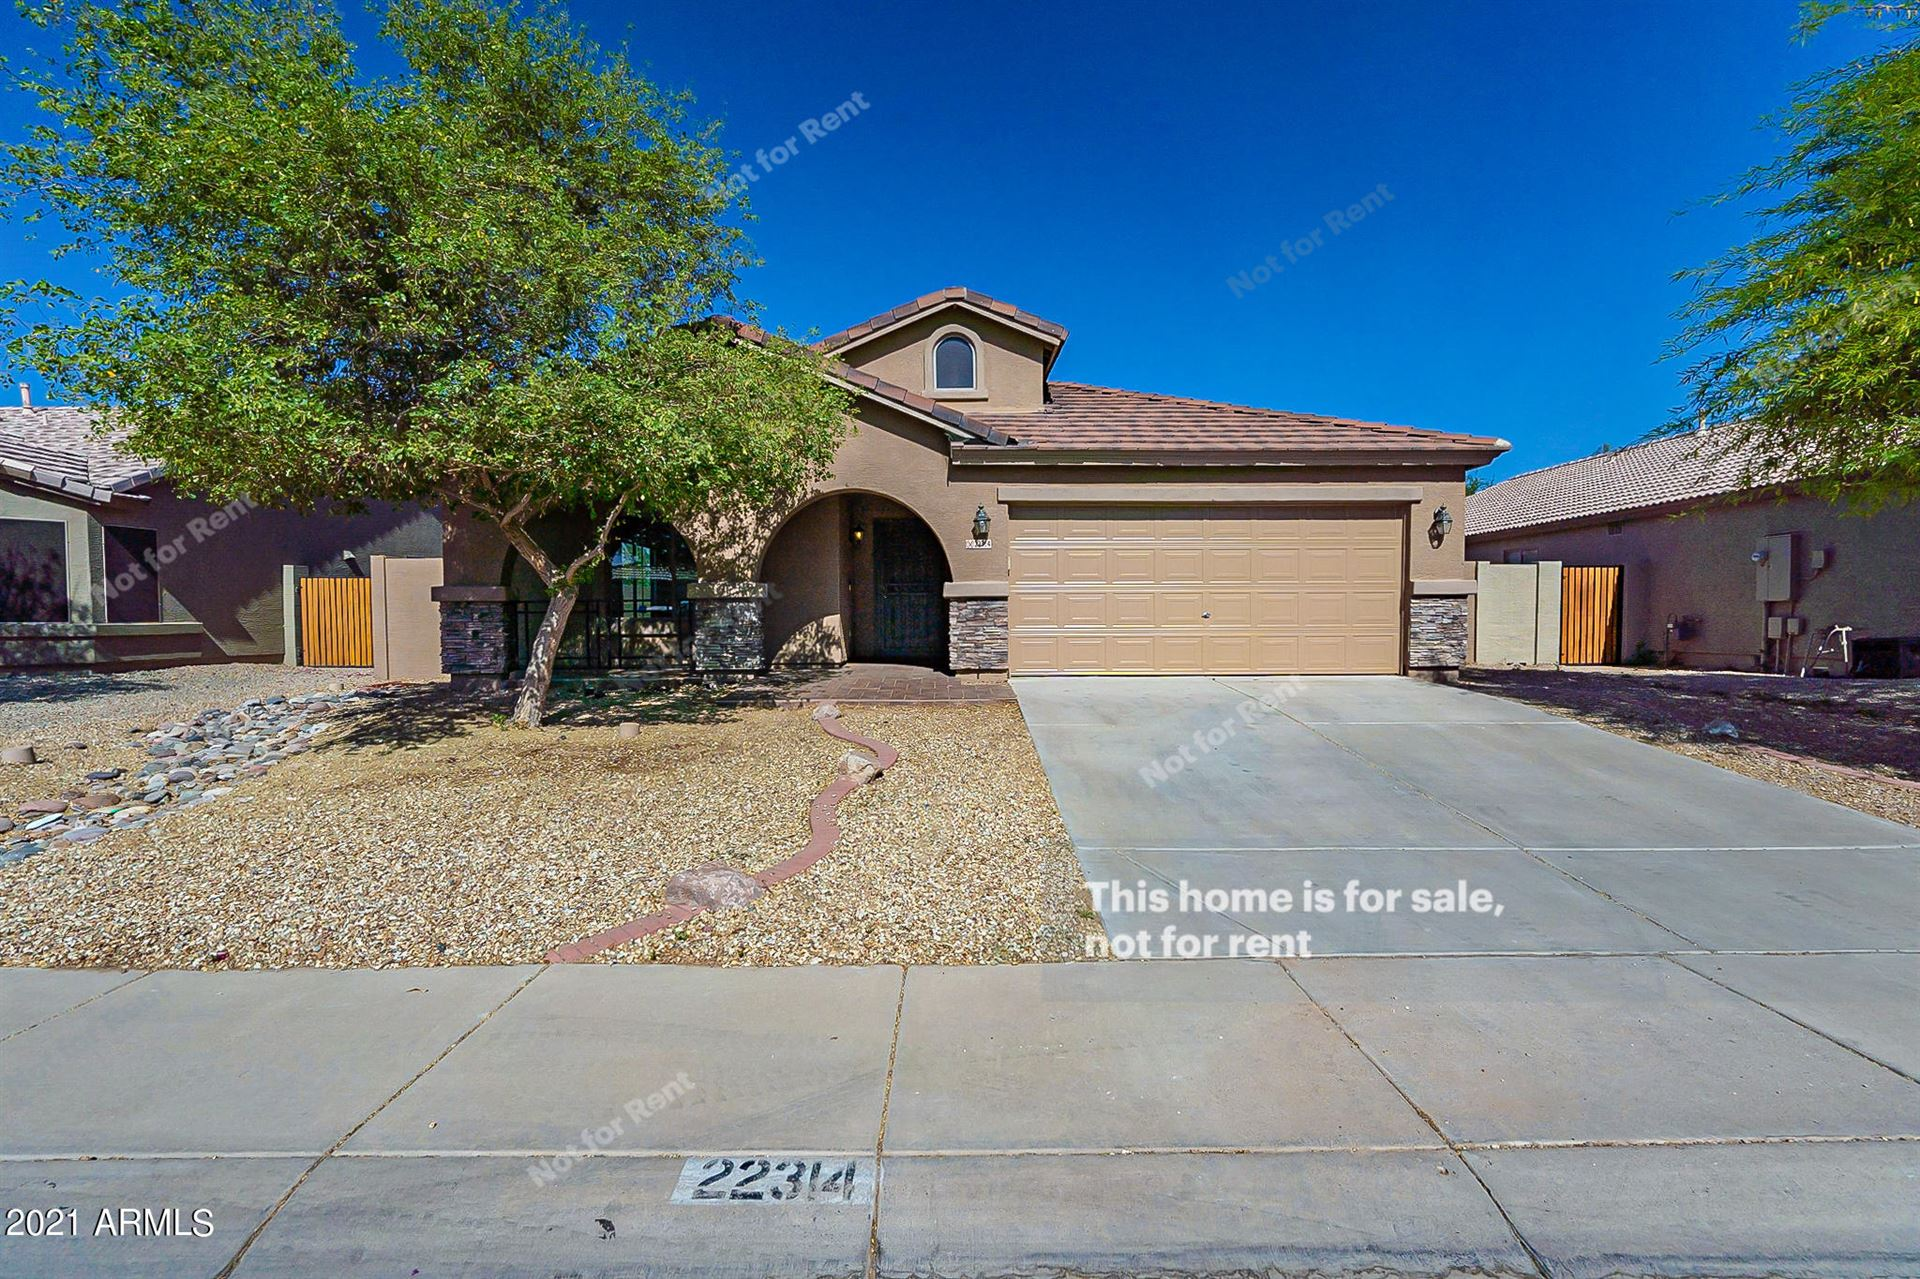 Photo for 22314 N BRADEN Road, Maricopa, AZ 85138 (MLS # 6219445)